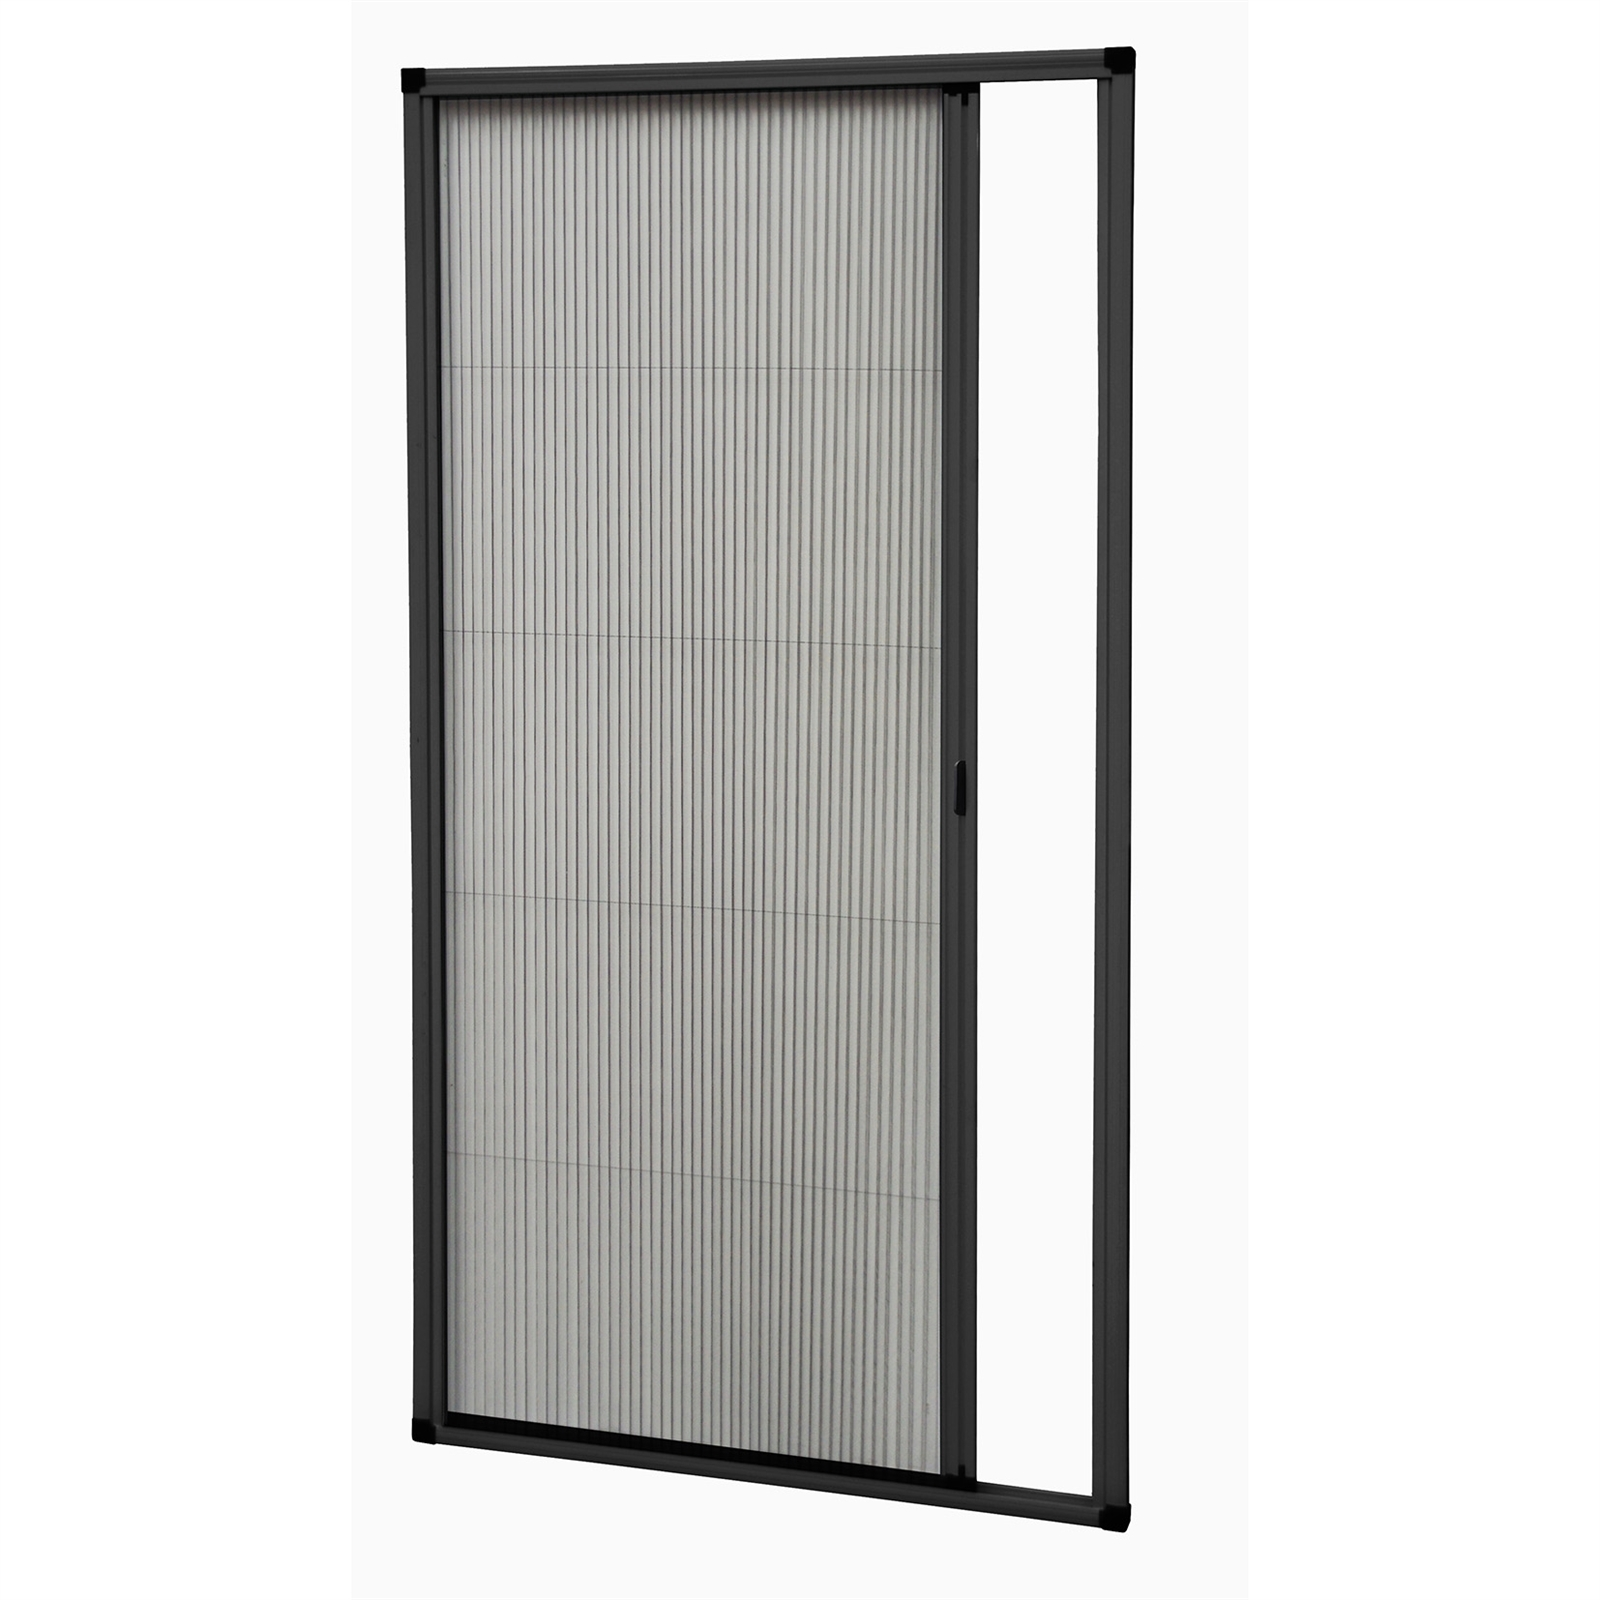 Pillar Products 1.0 x 2.04m PlusOne Modular Pleated Flyscreen Door